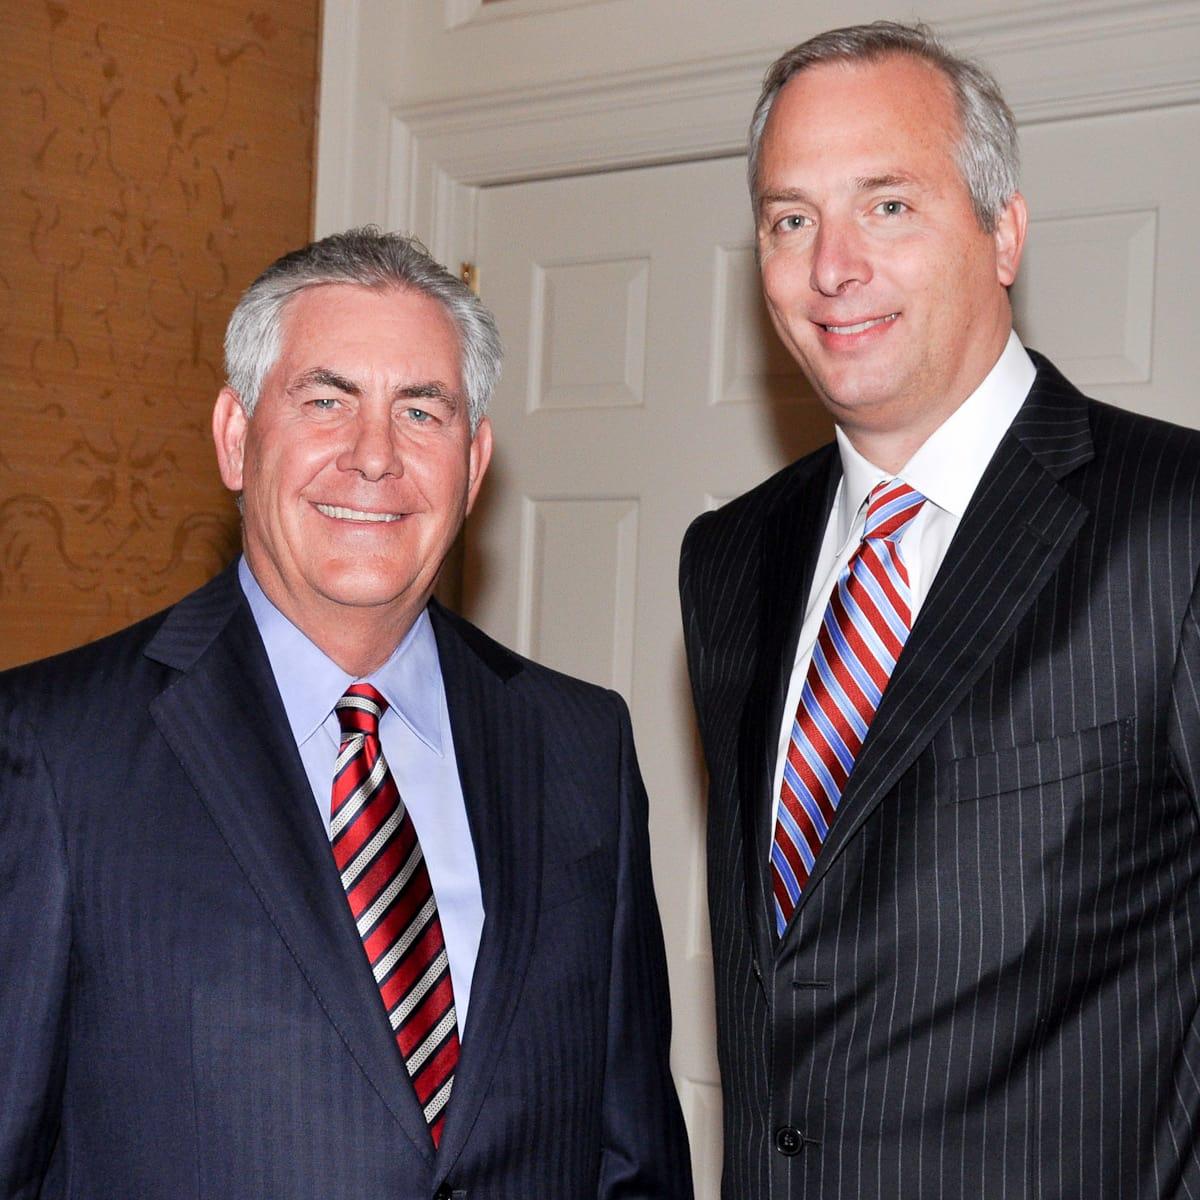 News_United Way deTocqueville_2009_Rex Tillerson_Bobby Tudor